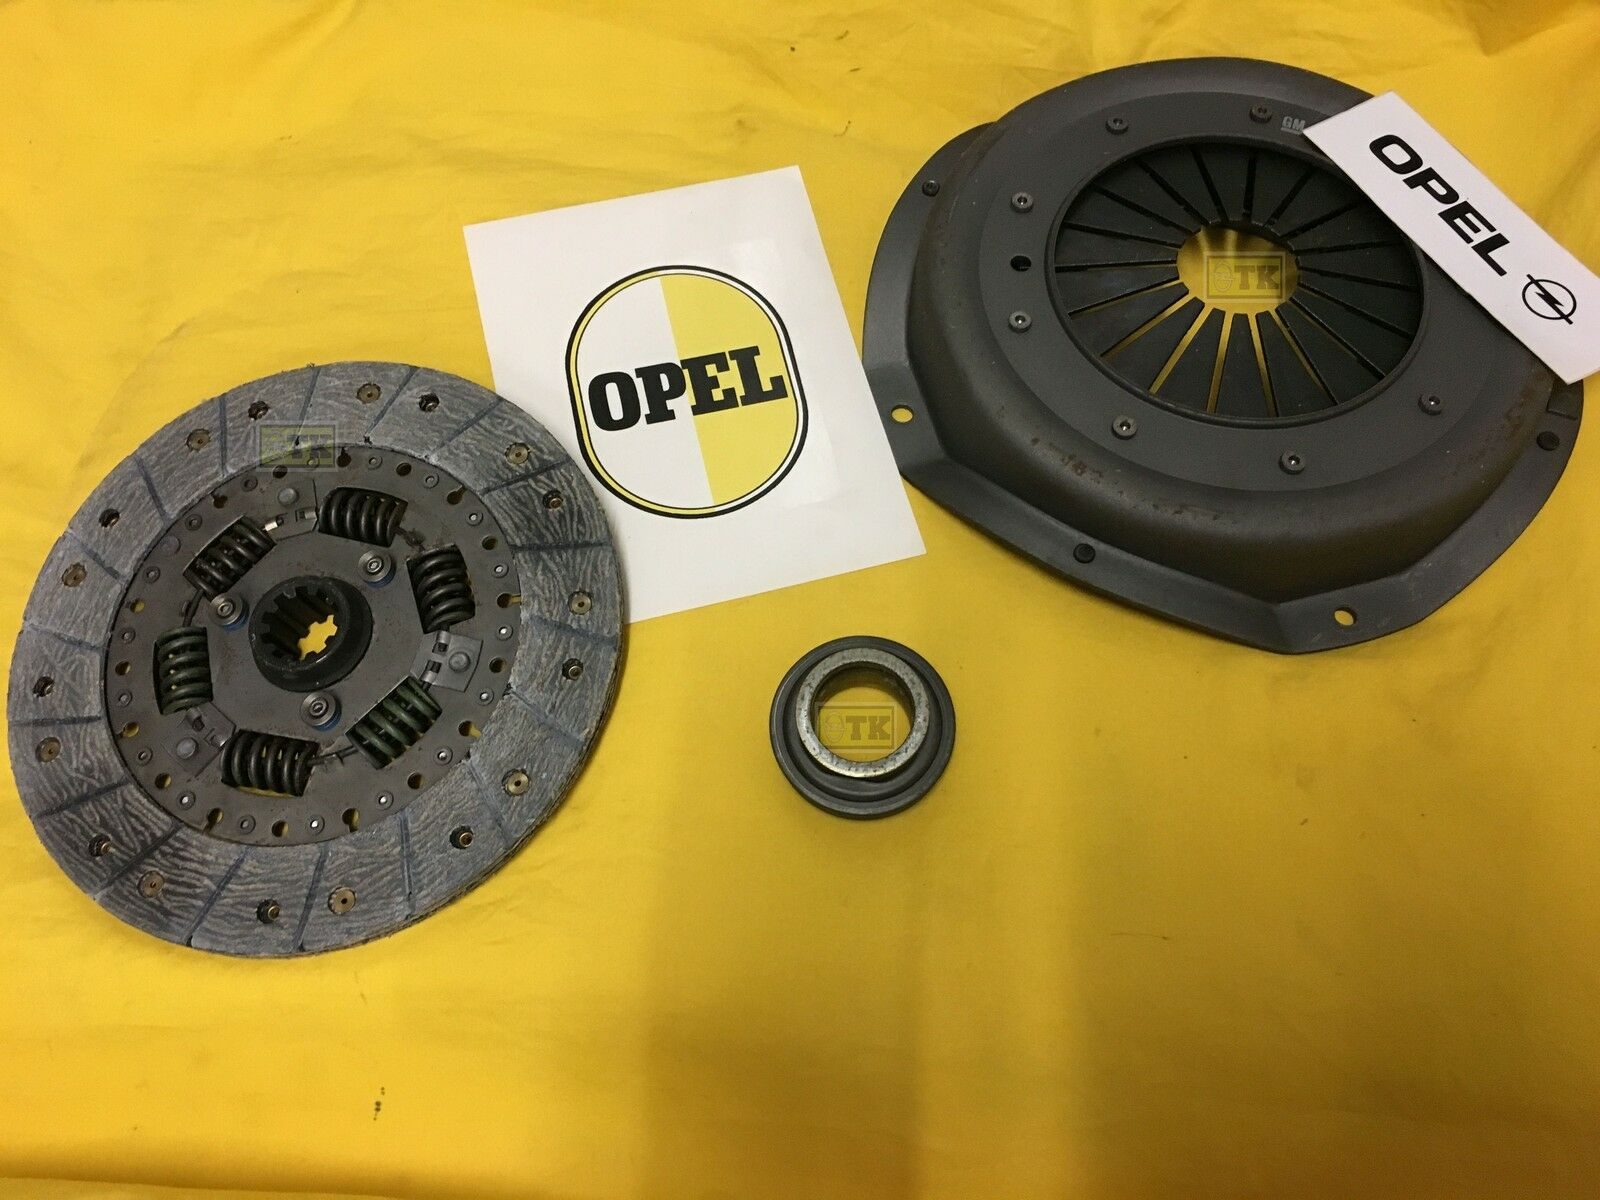 neu original opel 9 zoll kupplung komplett f r 5 gang zf. Black Bedroom Furniture Sets. Home Design Ideas